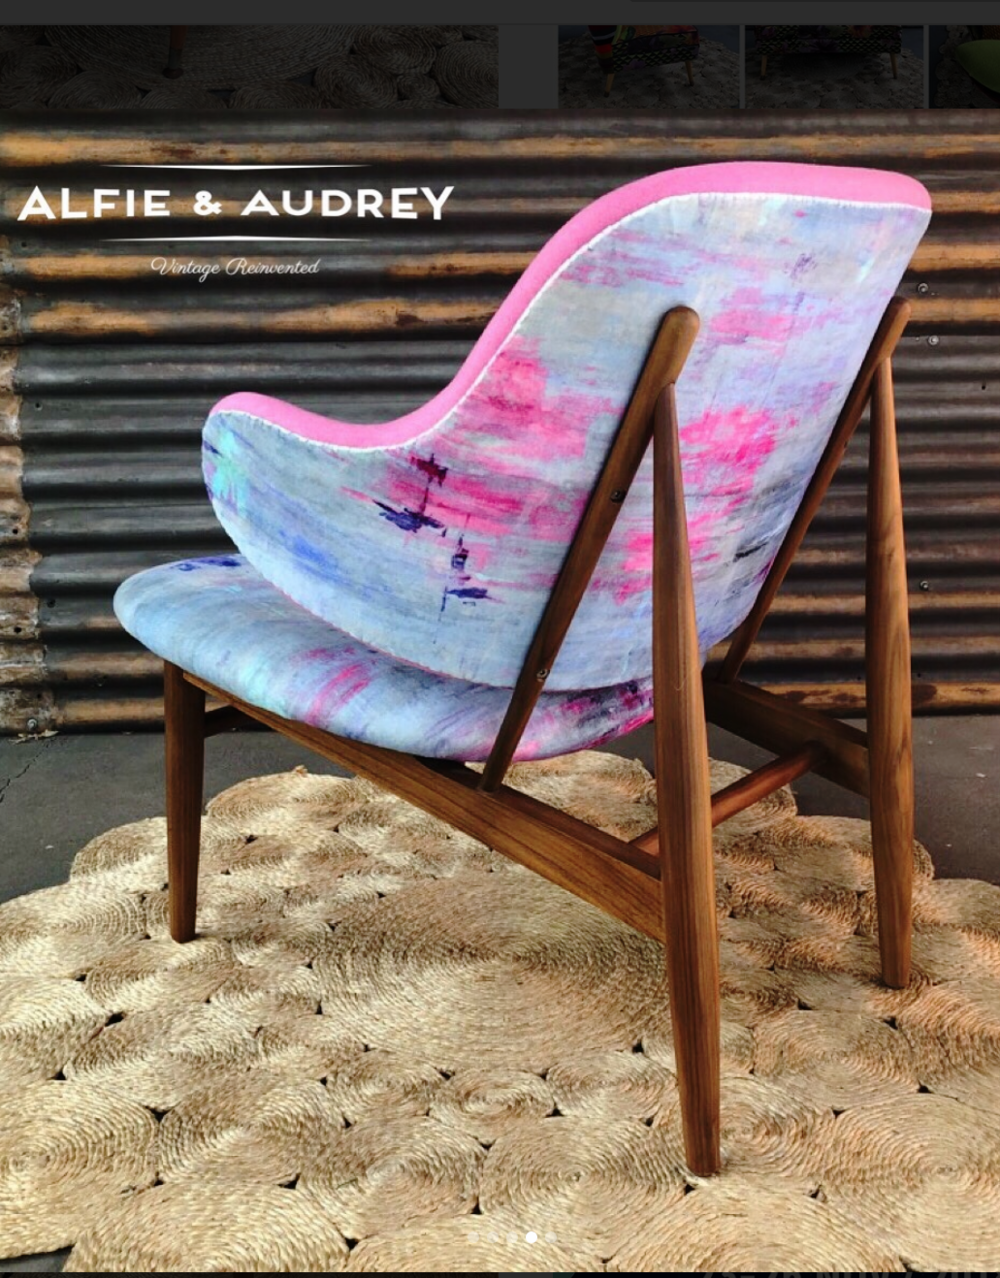 Mid-century chair restoration by Alfie & Audrey, Australia using cotton velvet in 'Reflection' from Salon Libertine London.